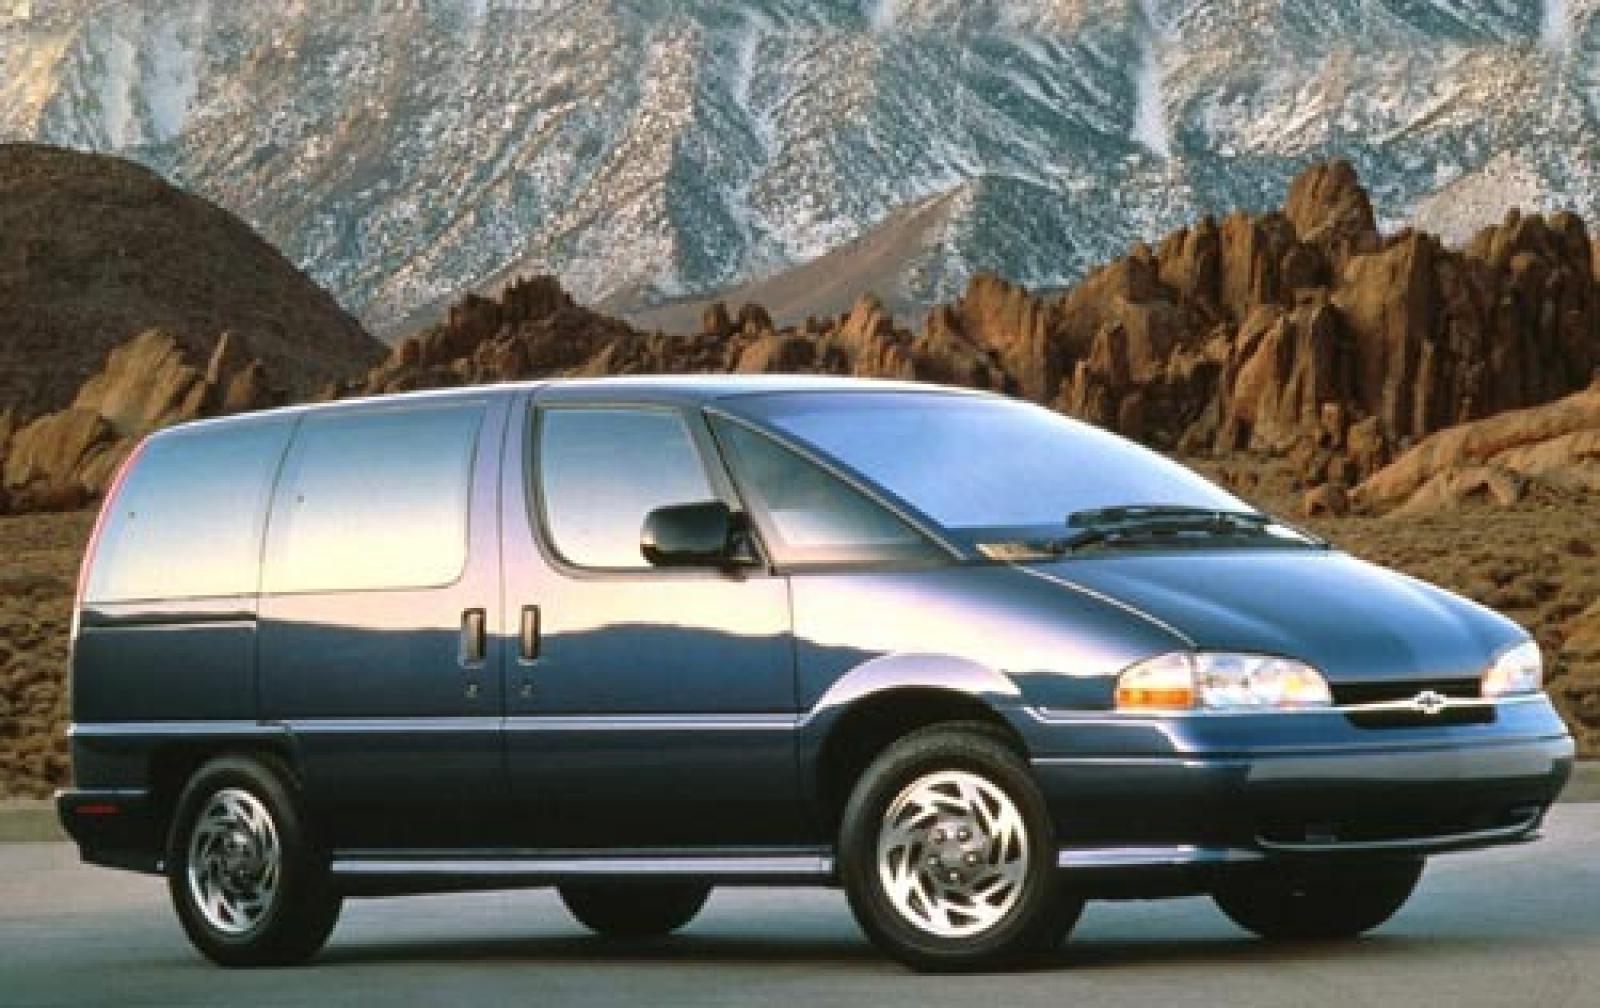 1994 chevrolet lumina minivan 1 800 1024 1280 1600 origin